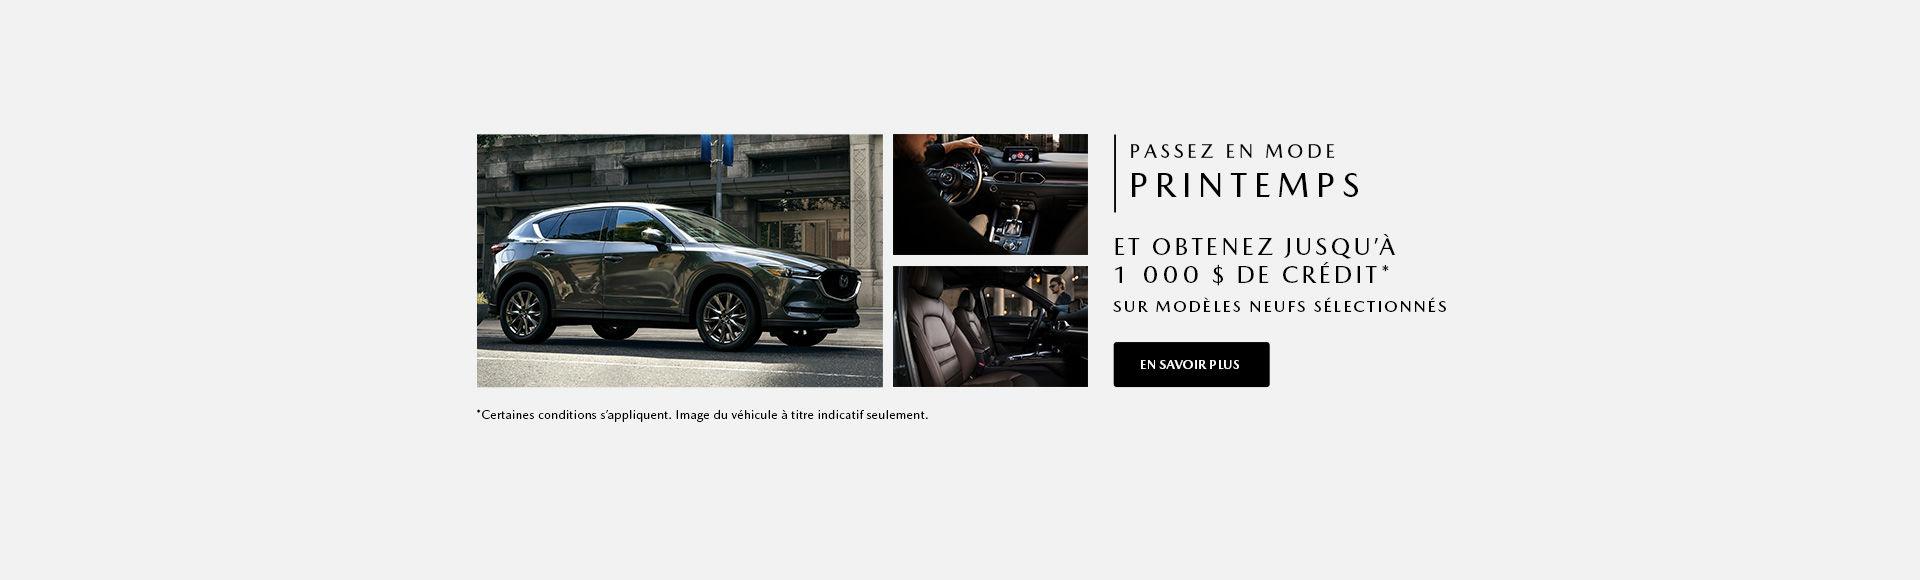 L'événement de Mazda